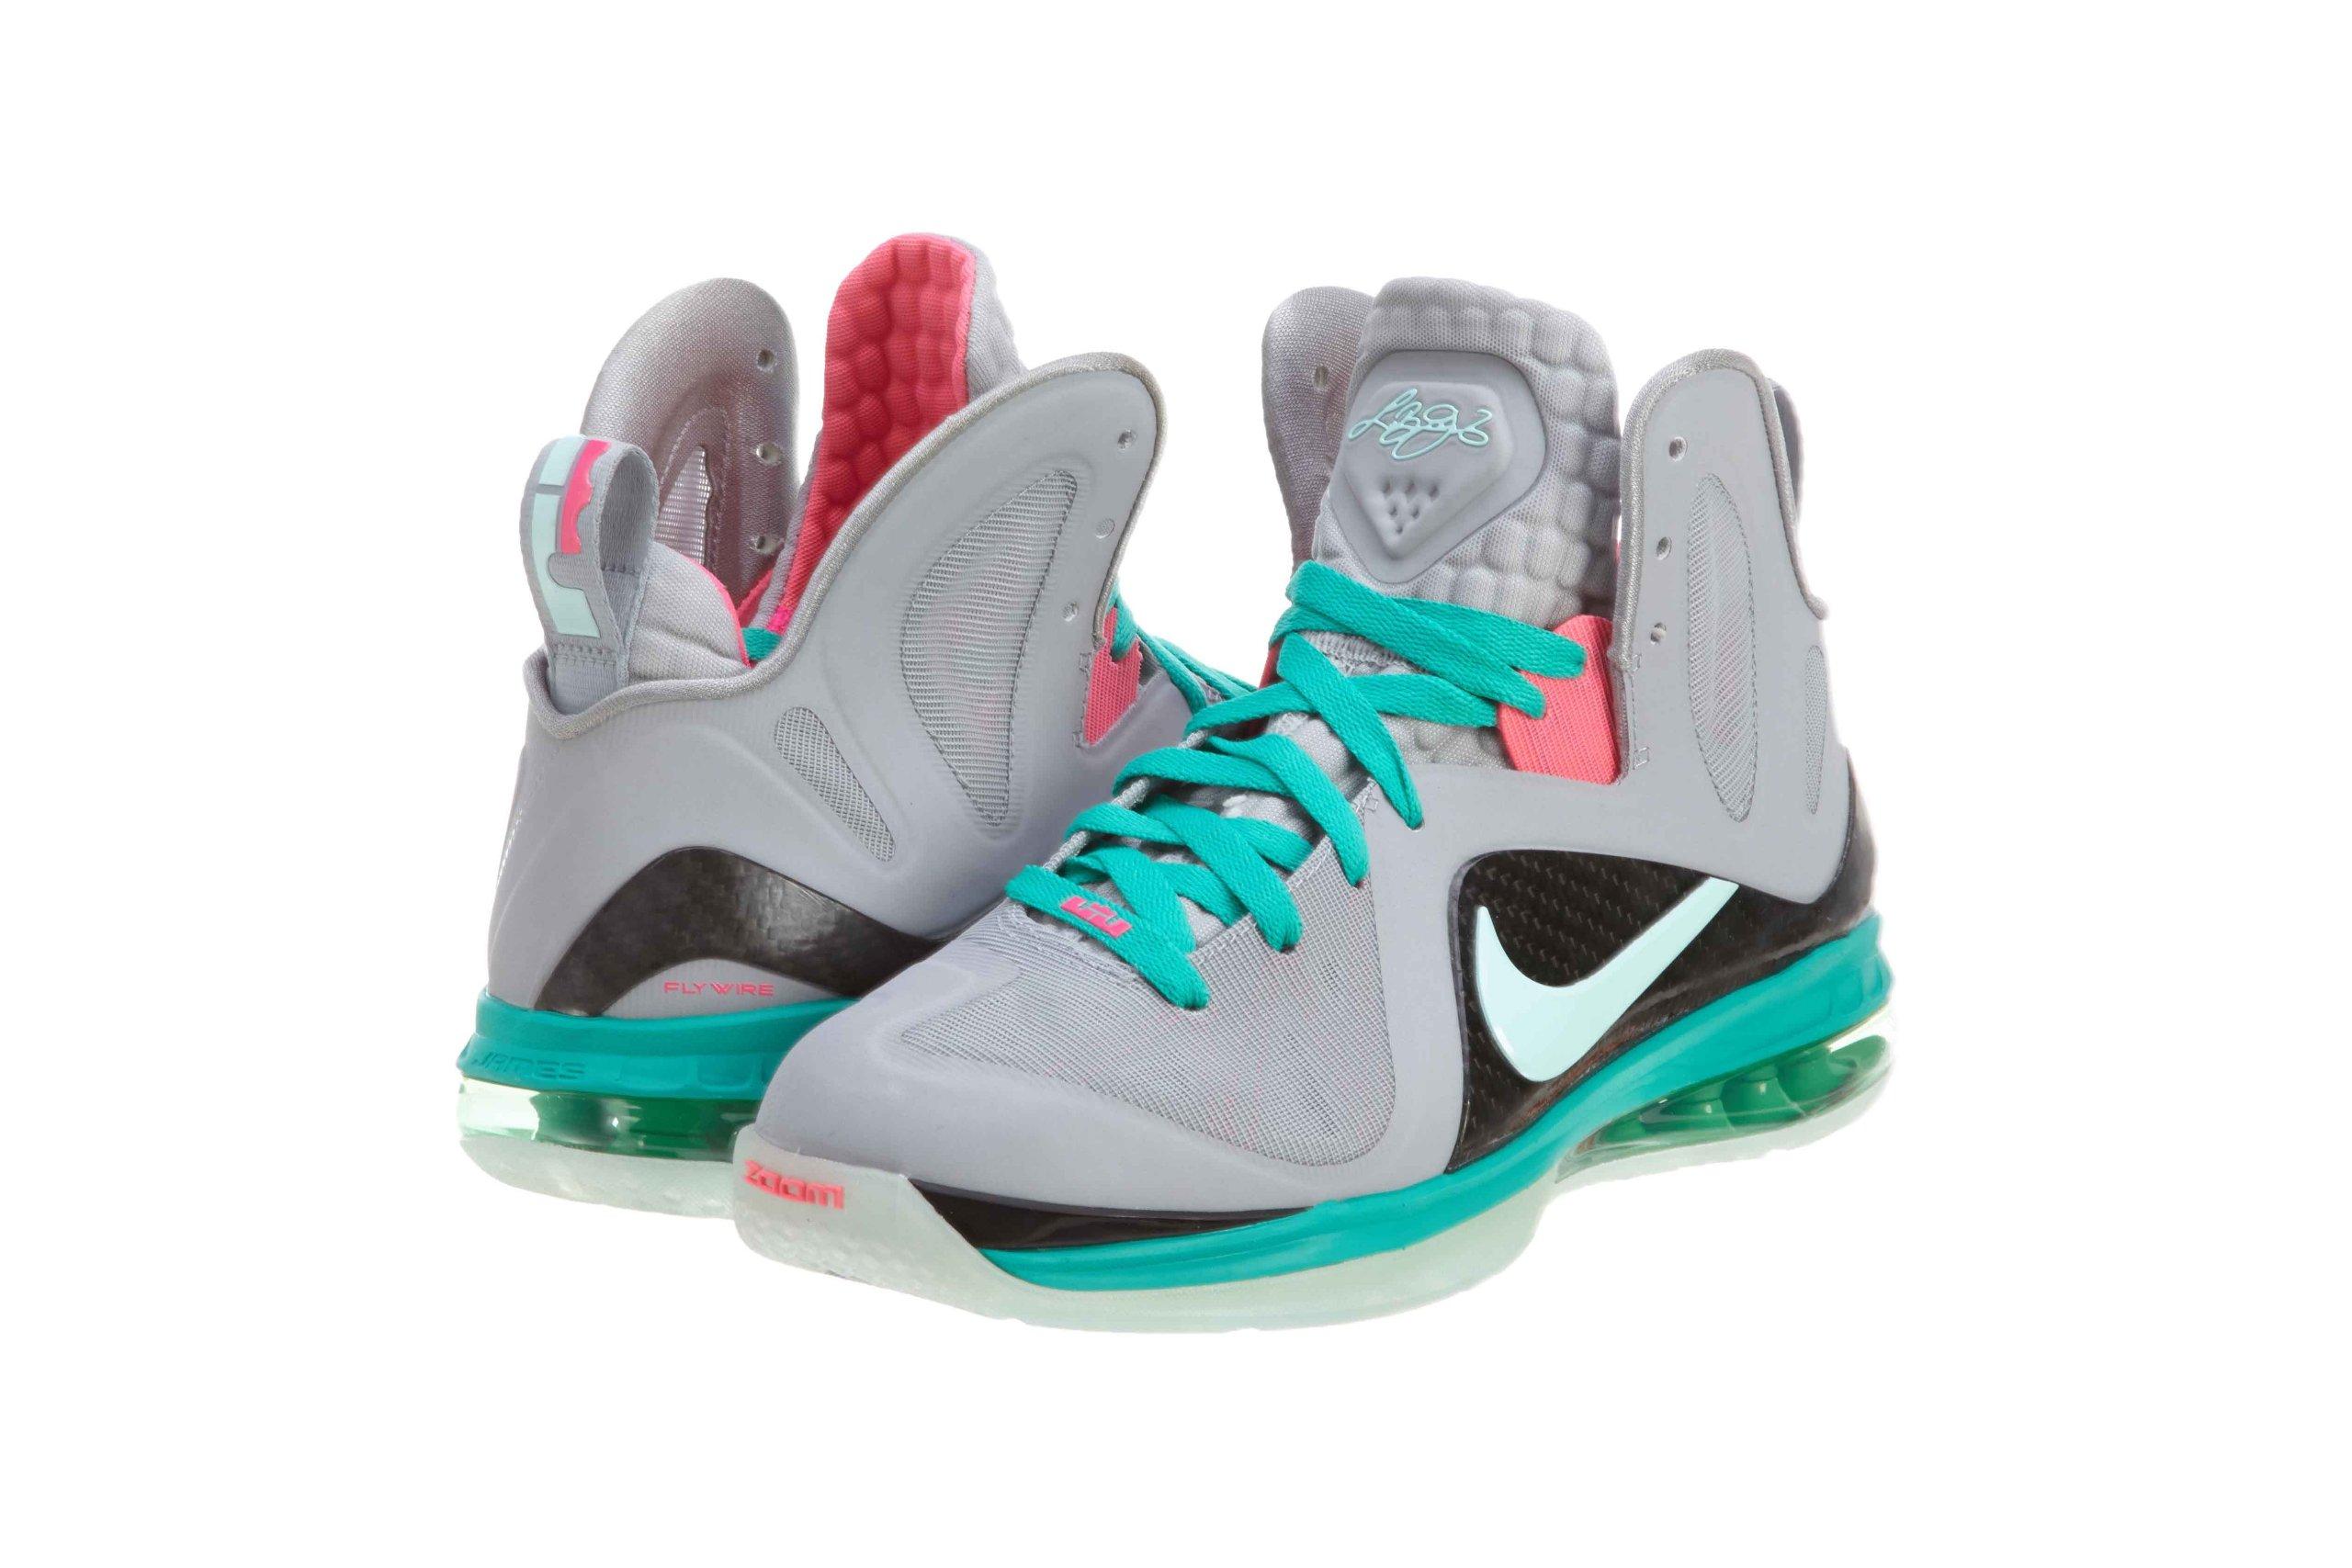 Nike Mens 516958-001 LEBRON 9 P.S. ELITE